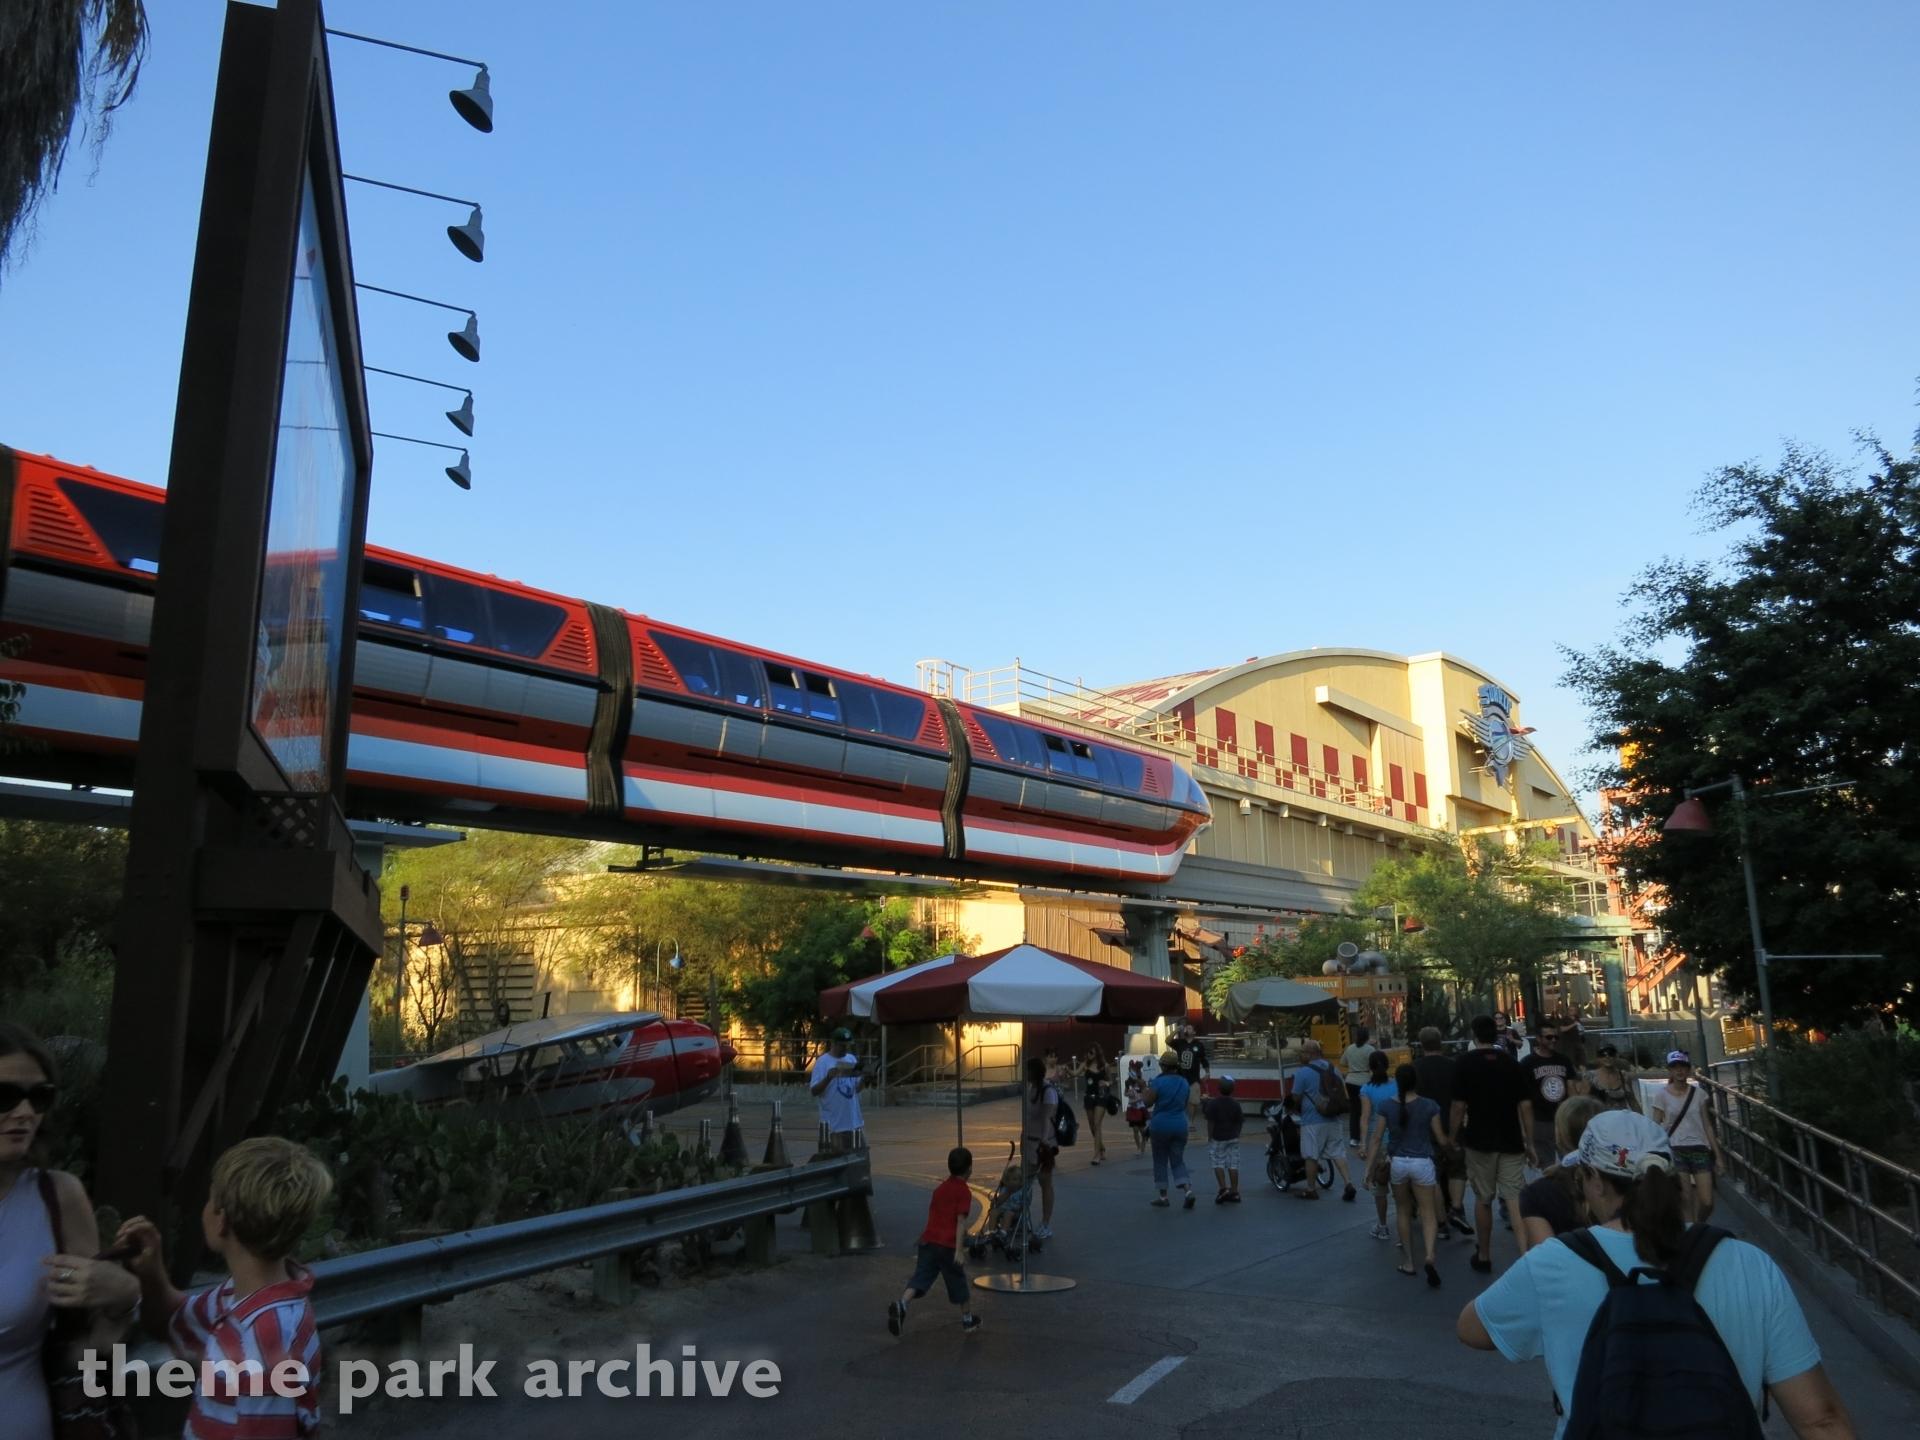 Condor Flats at Disney California Adventure